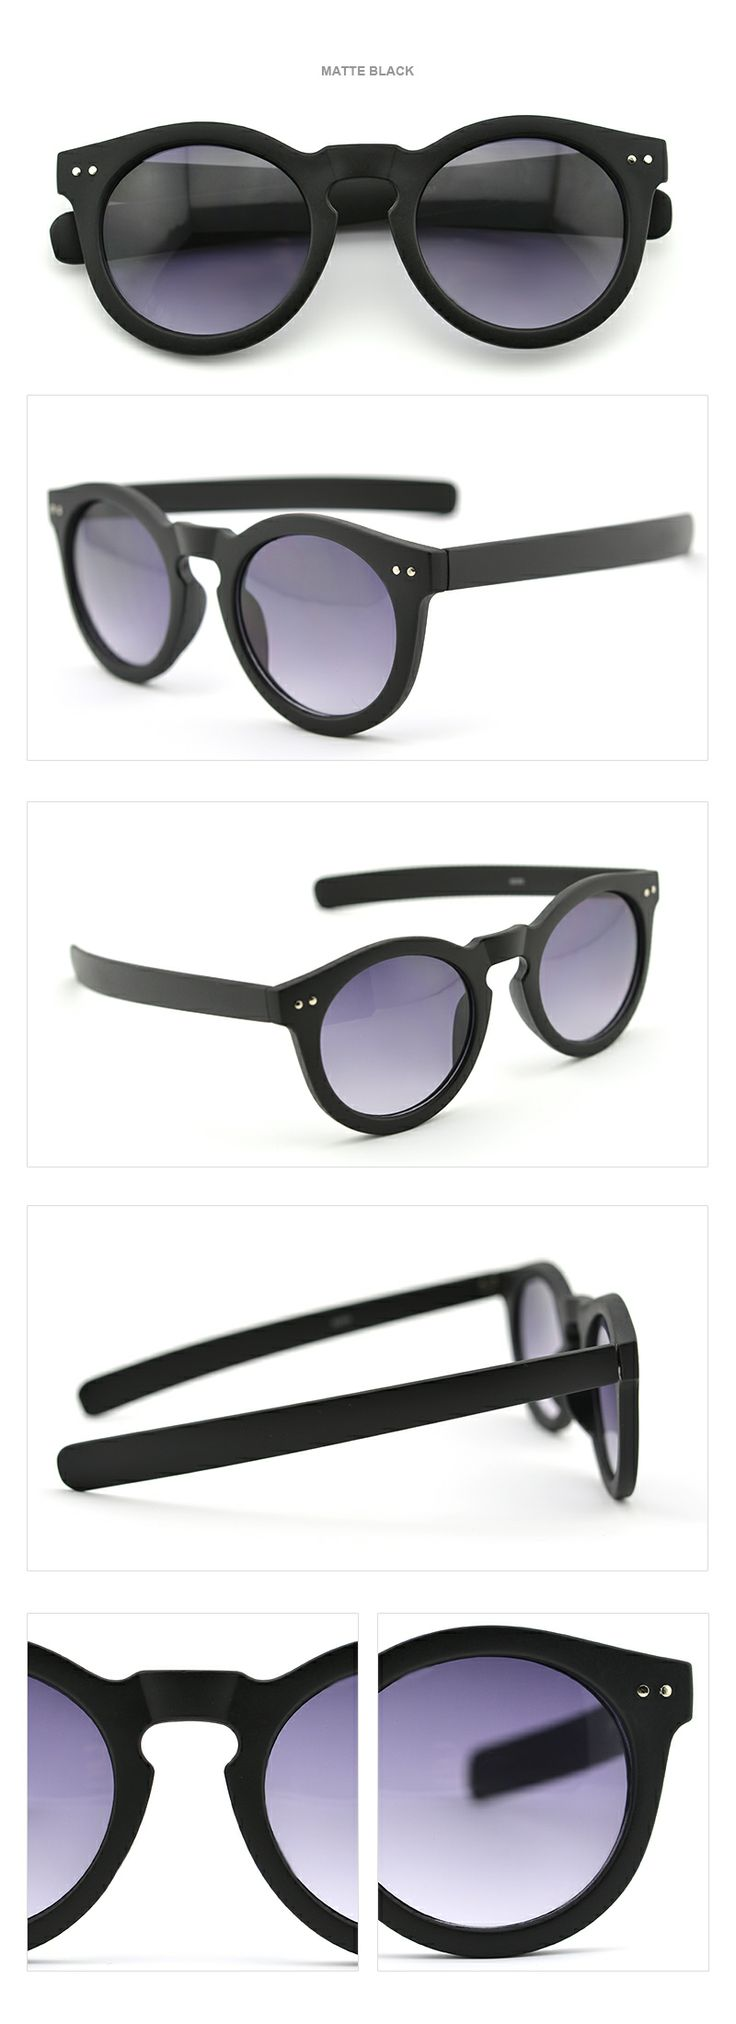 #Eyeglasses for round face Americas best eyeglasses Designer sunglasses Classic Wayfarer style straight leg #Eyeglasses for round #Designer sunglasses #Classic Wayfarer style #Straight Leg Visit - FUNMEMO.COM  to see More